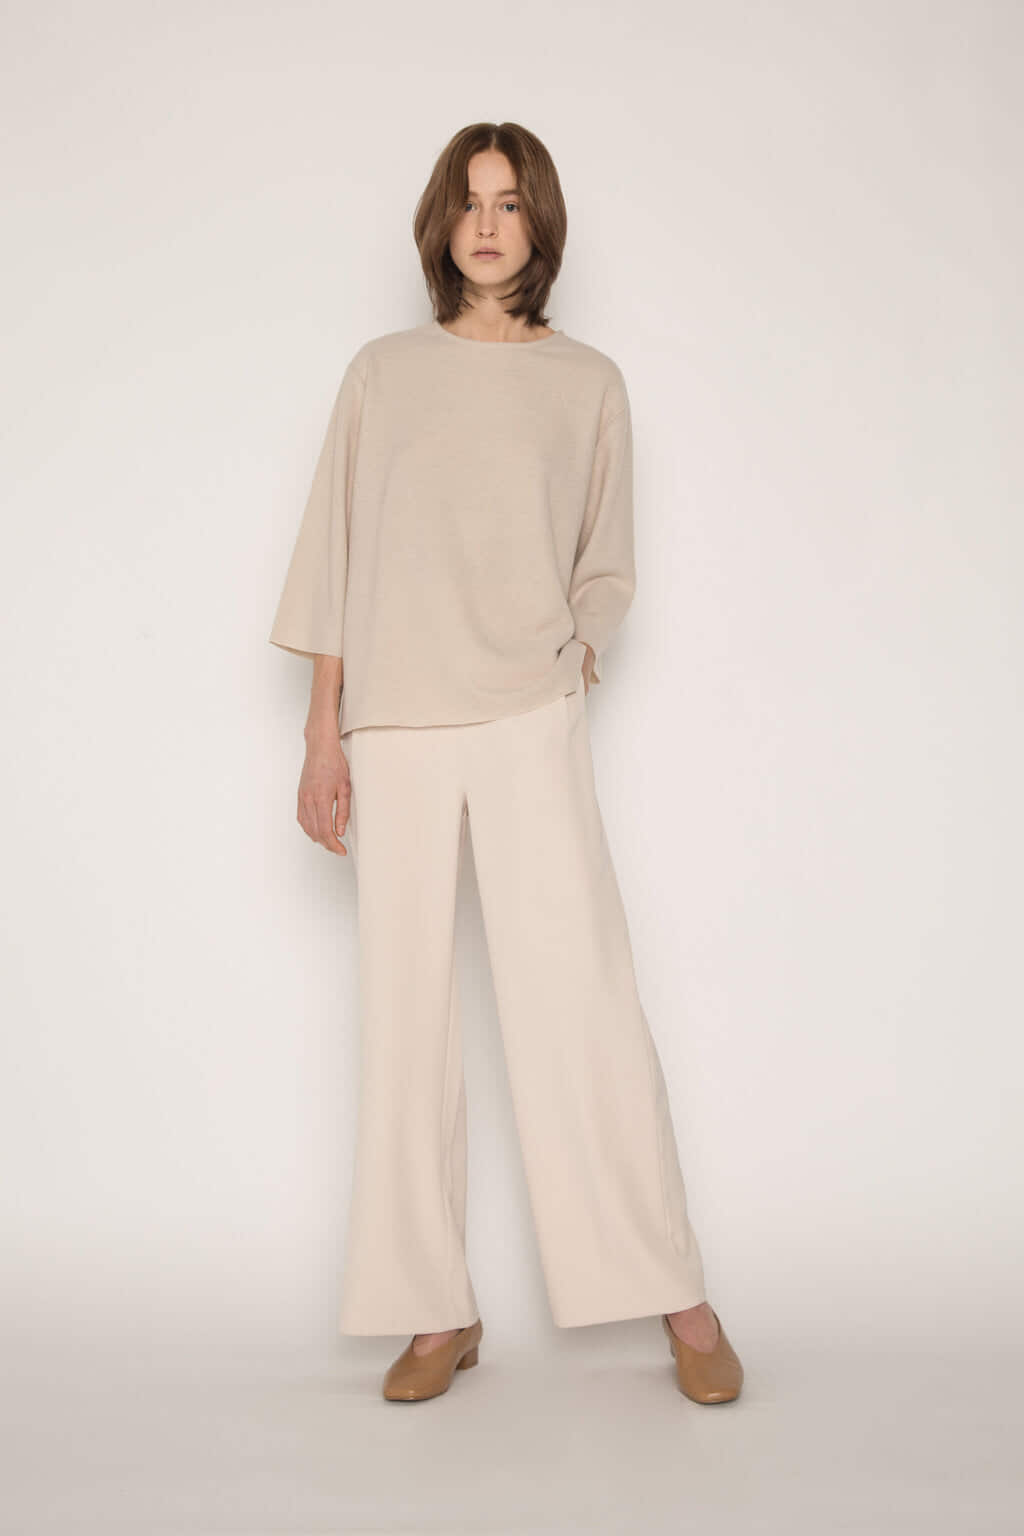 Sweater 1641 Oatmeal 1